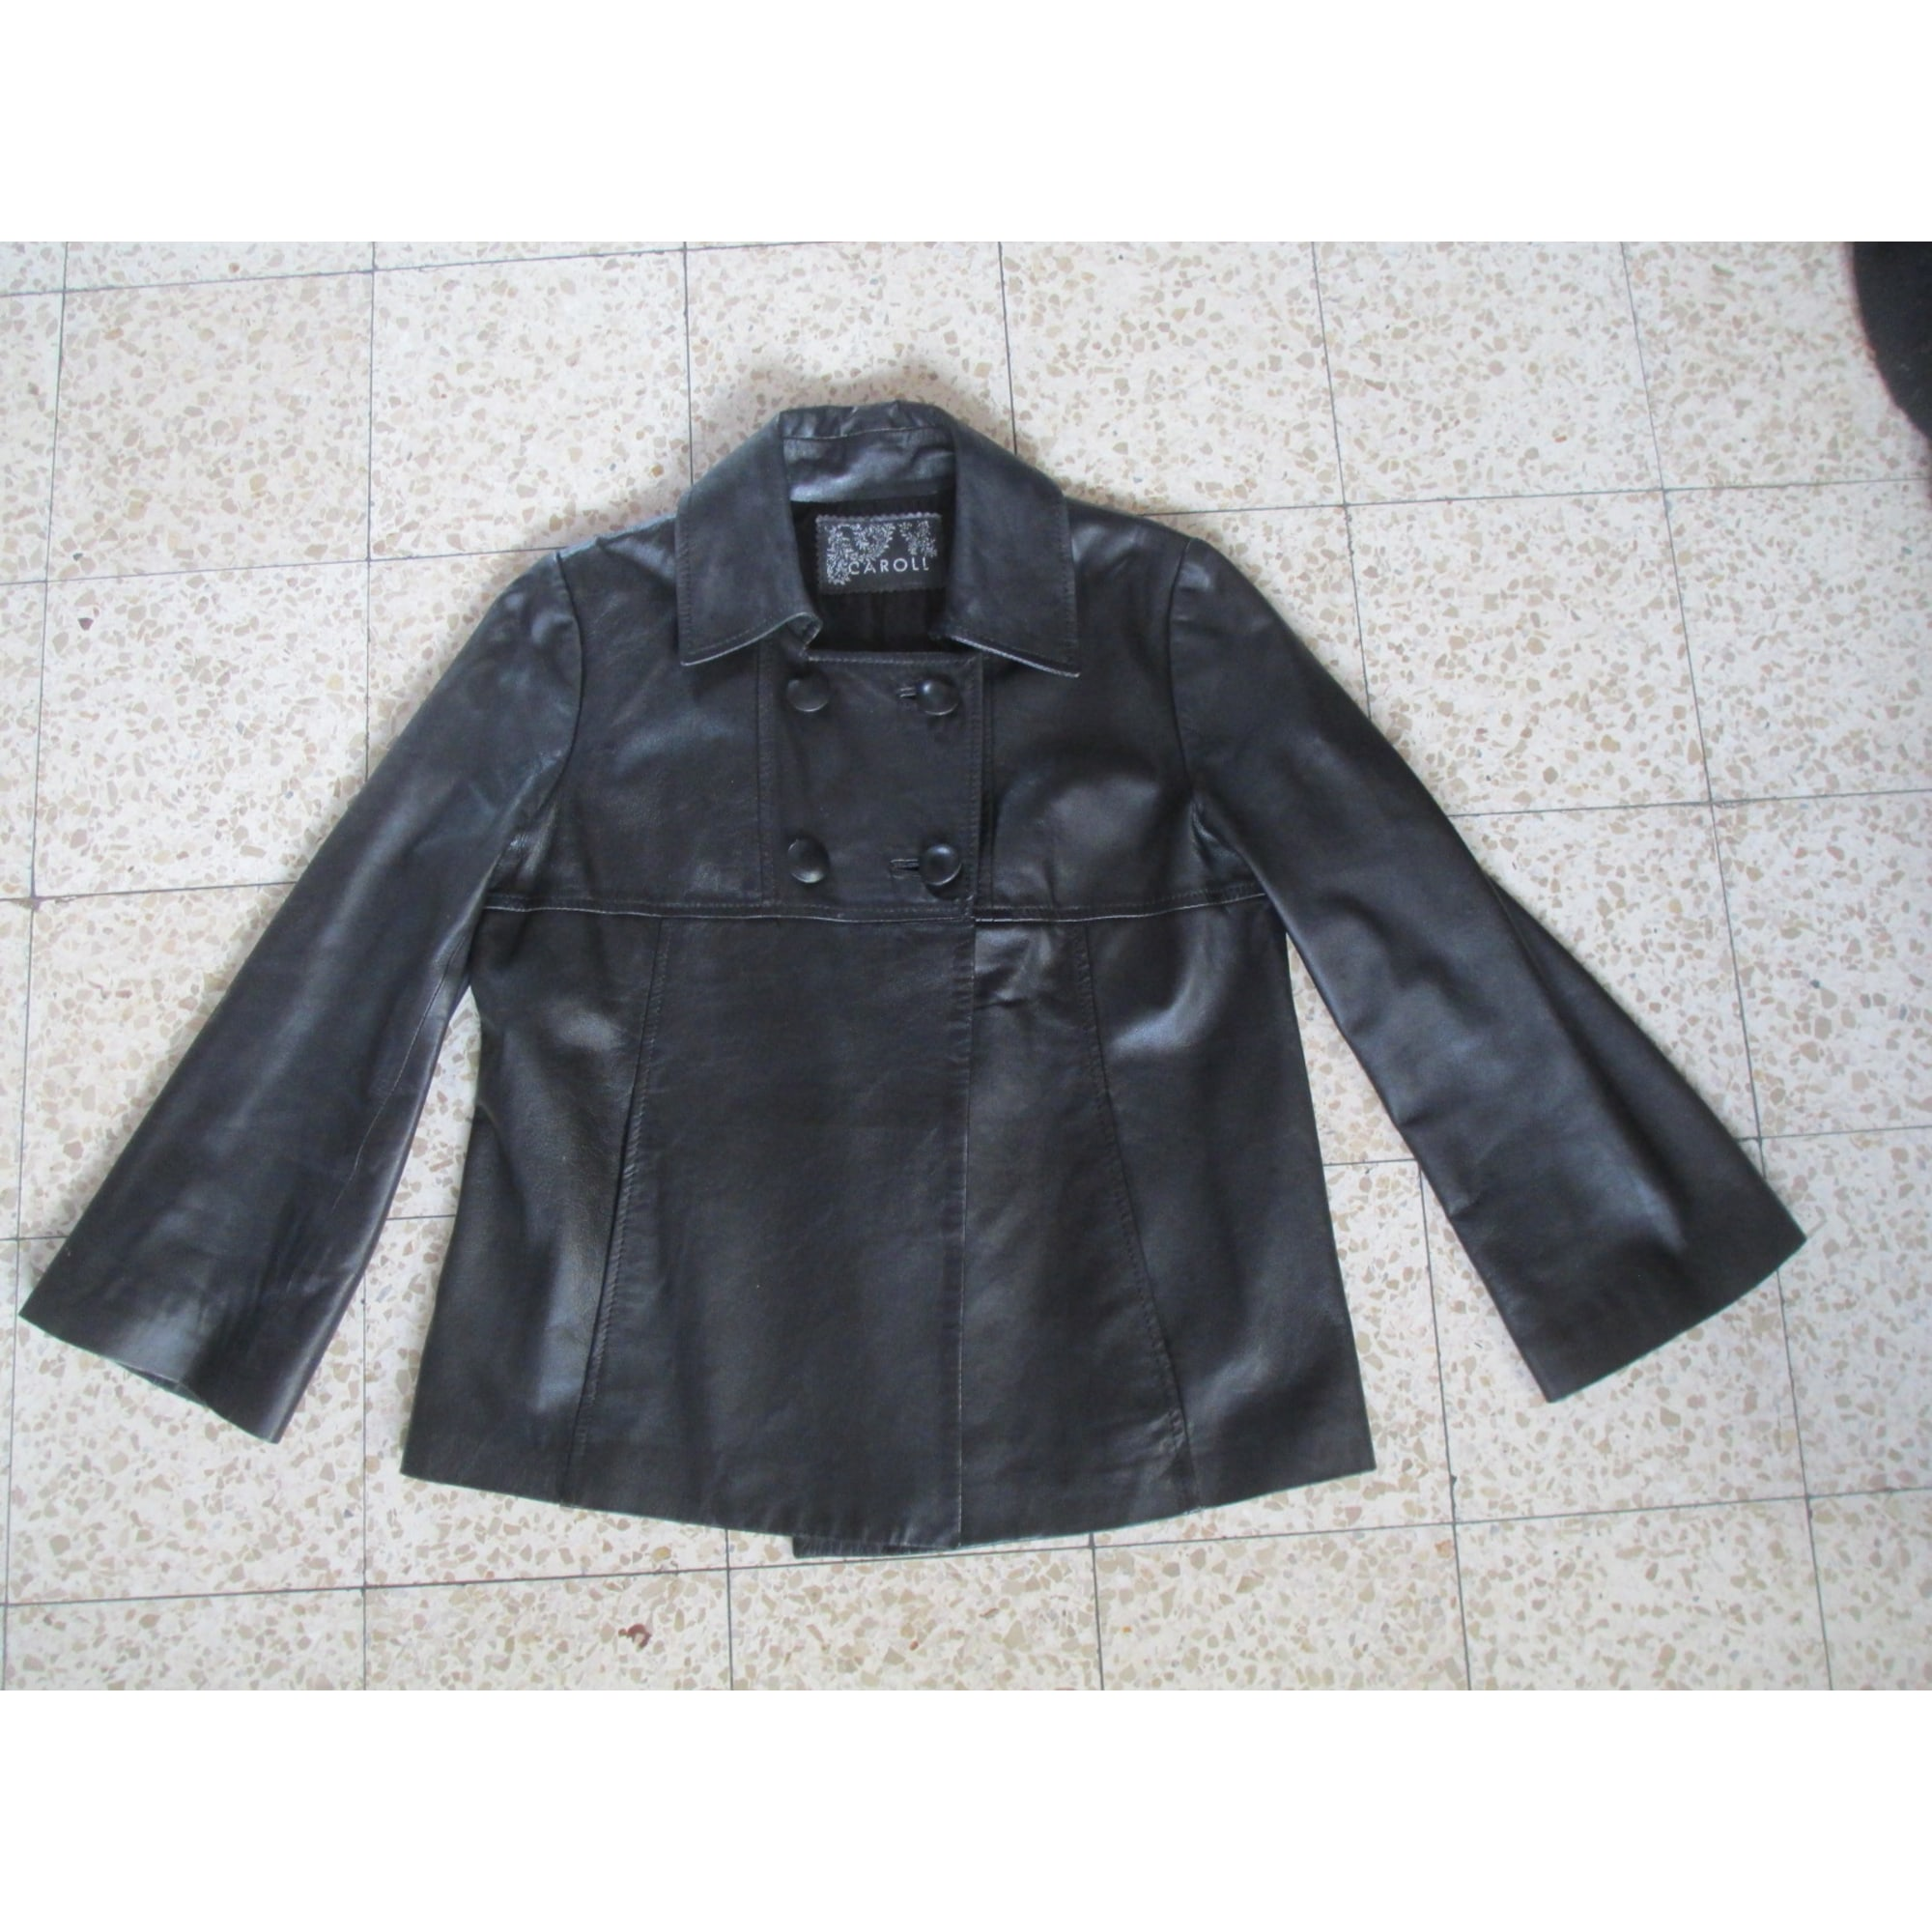 Veste en cuir CAROLL 36 (S, T1) noir - 6274264 b23dbc4d069